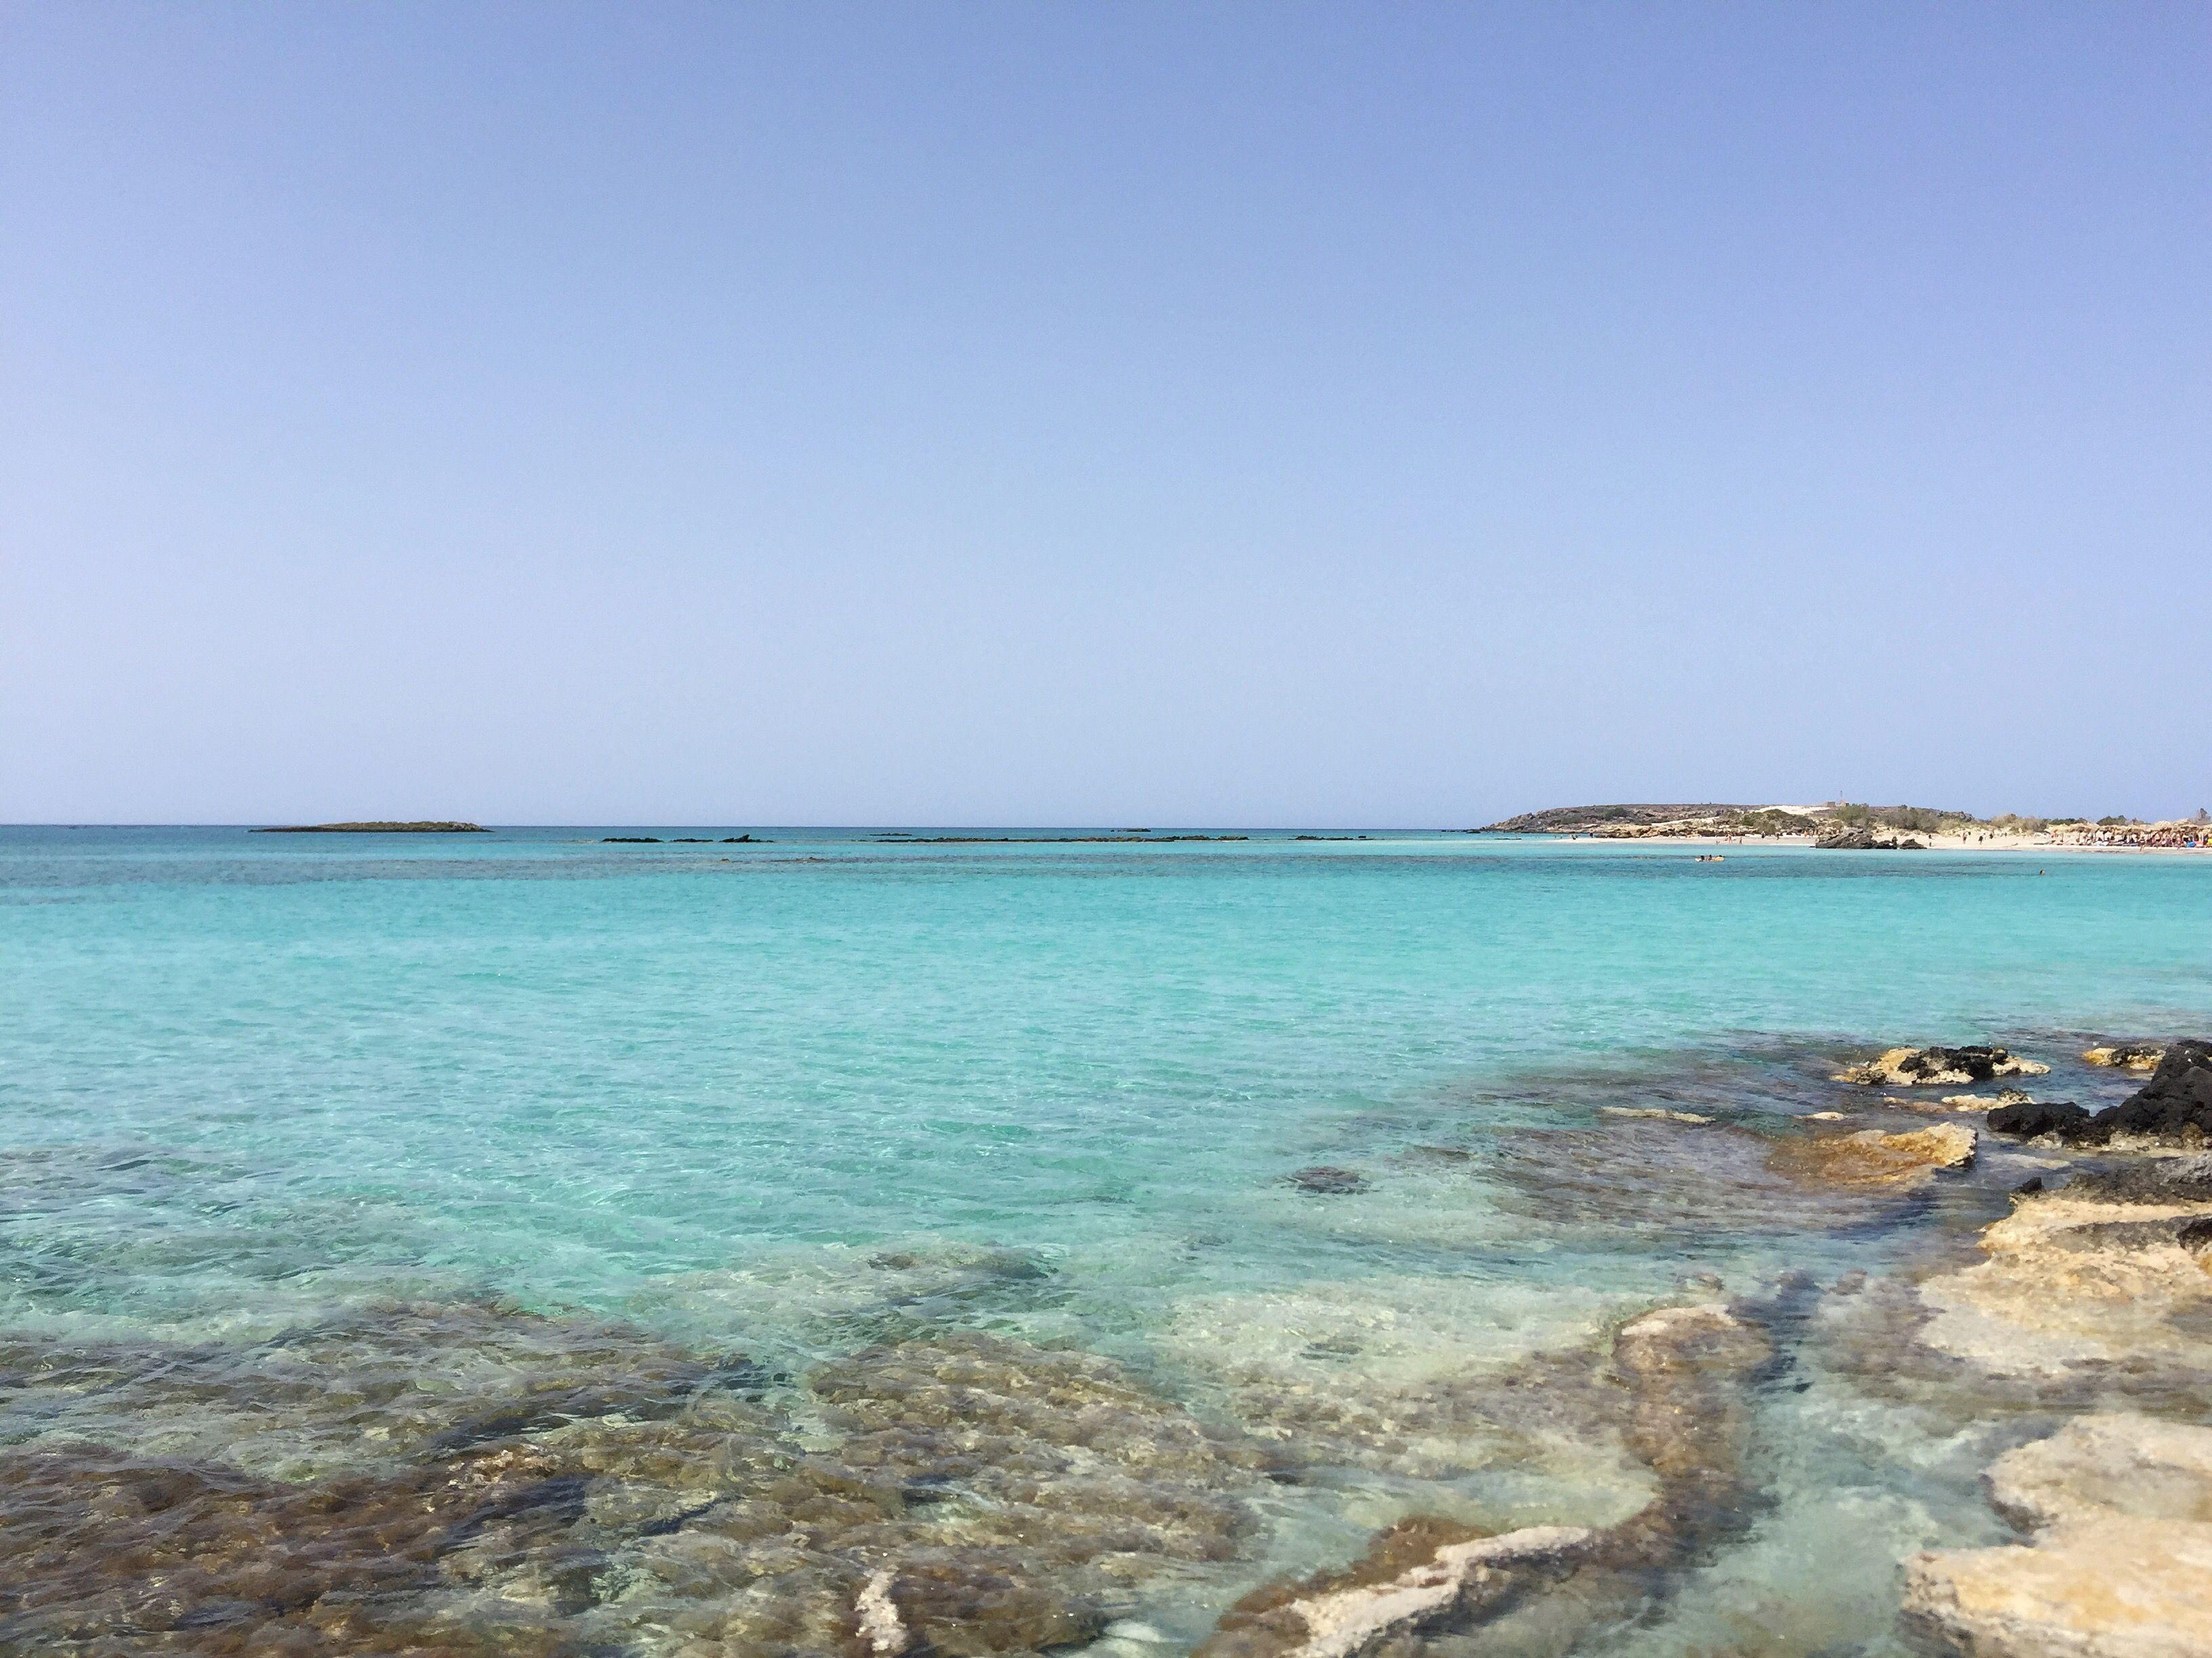 Elafonissi Beach, Crete, Greece ☀️🇬🇷